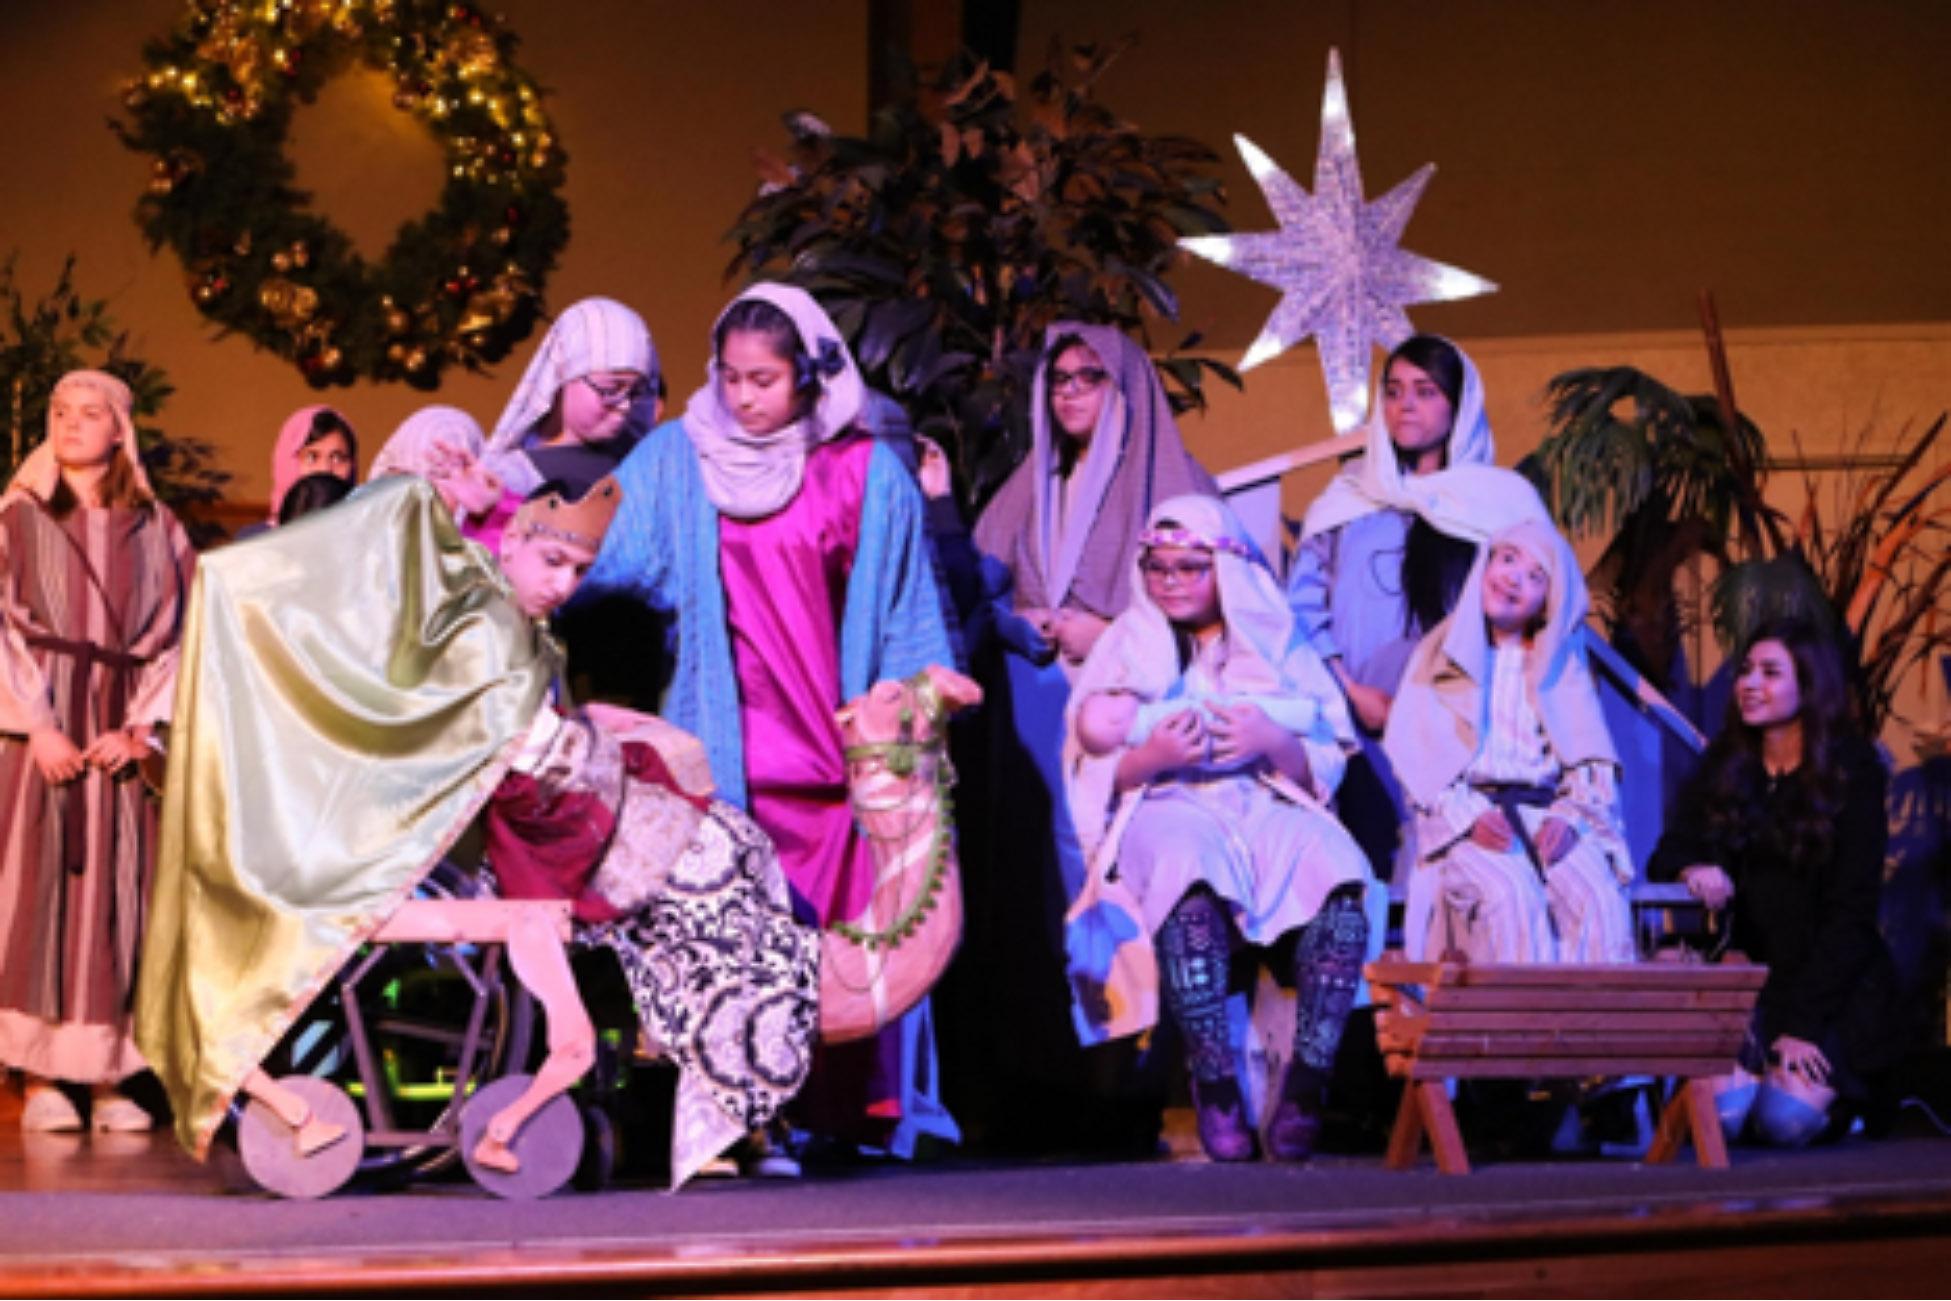 nativity dec 2019 pic 1.jpg